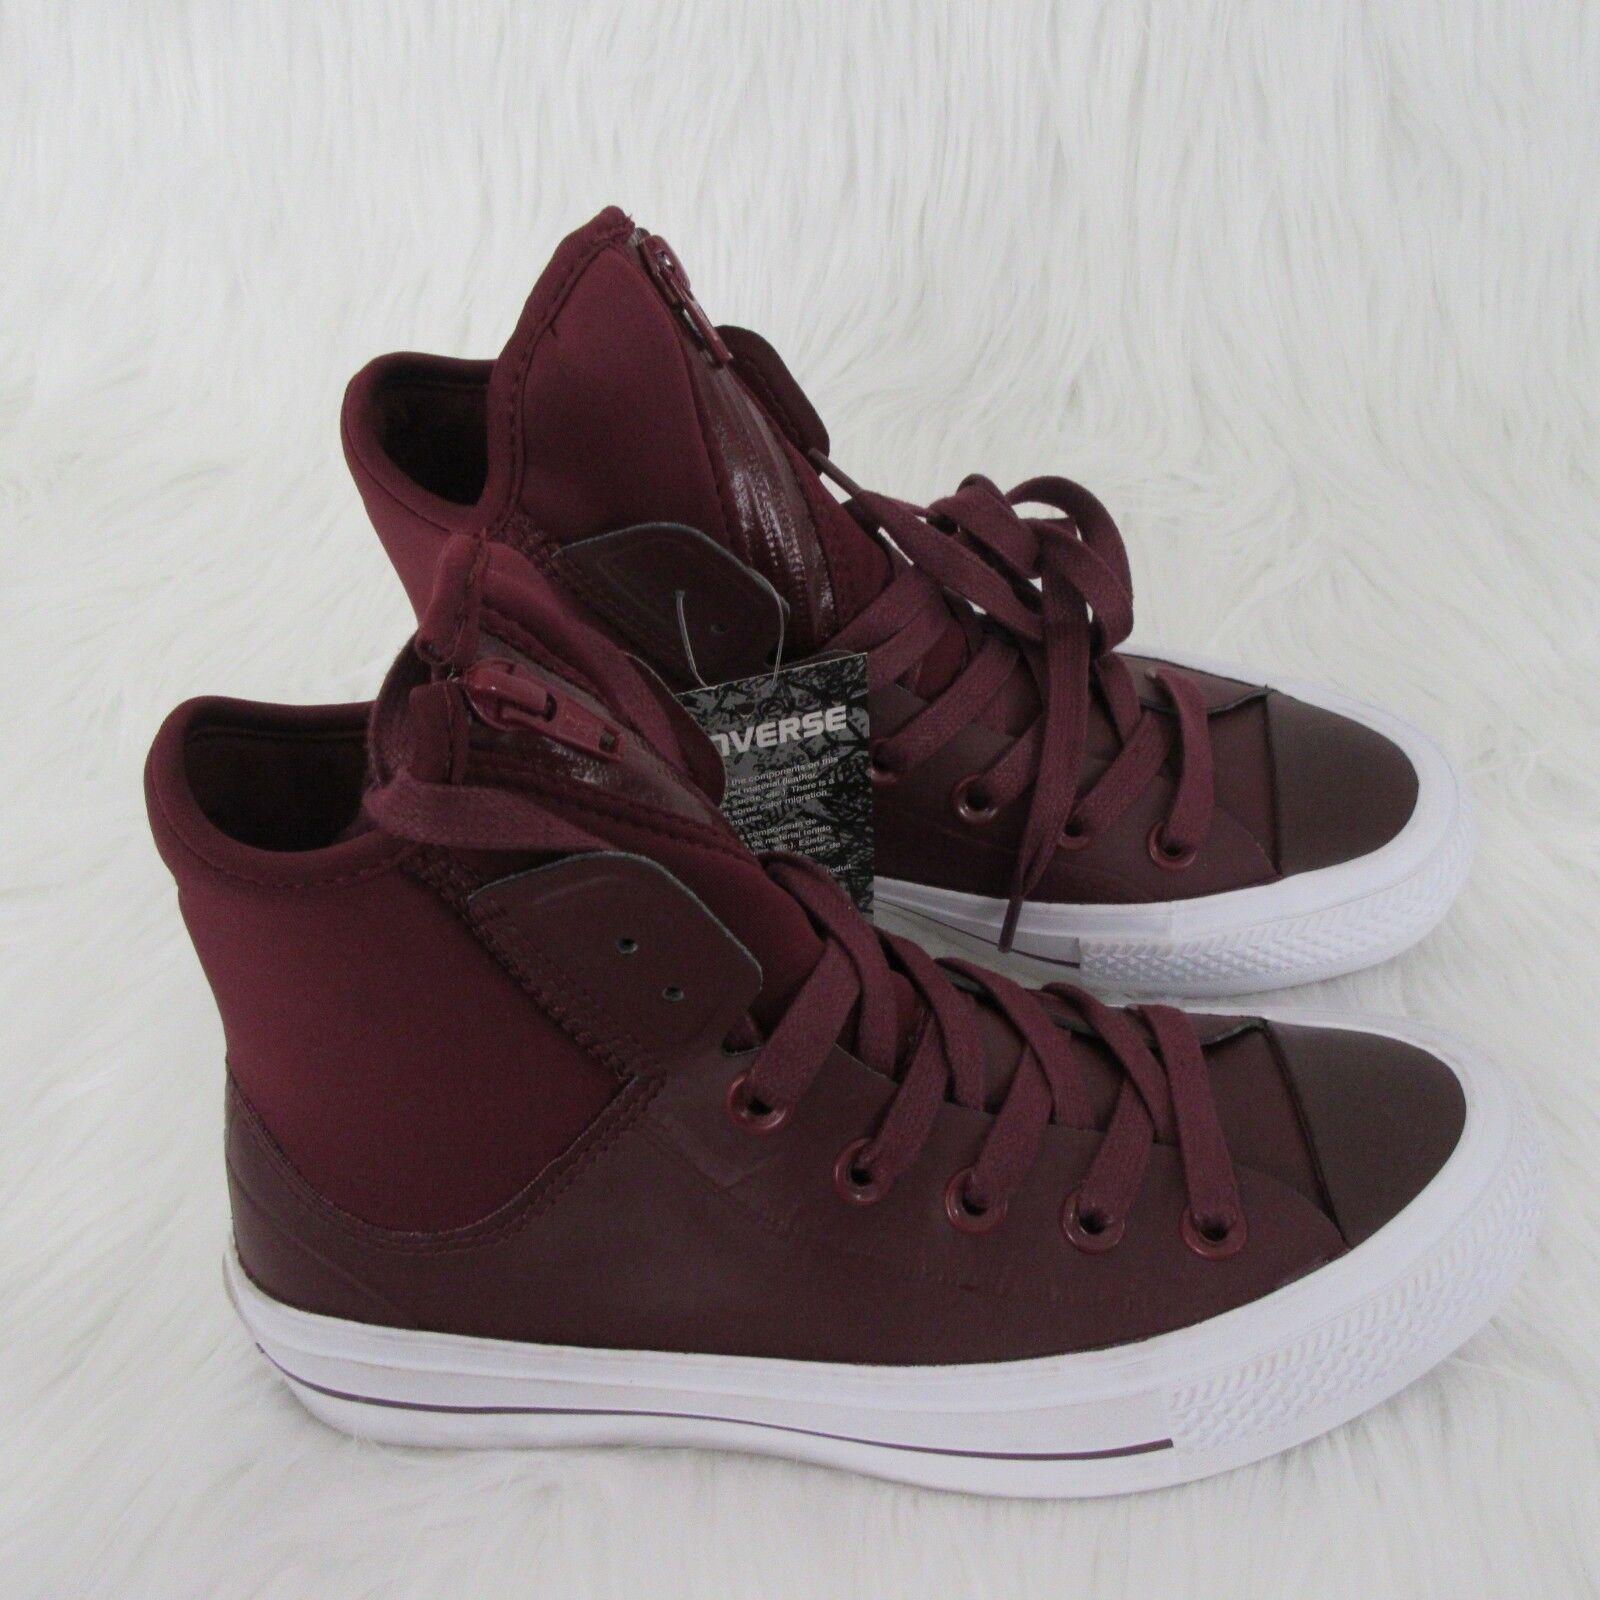 Converse Chuck Taylor All Star MA-1 SE Hi Casual 6 Shoe 153633C Maroon Size 6 Casual dd1f50